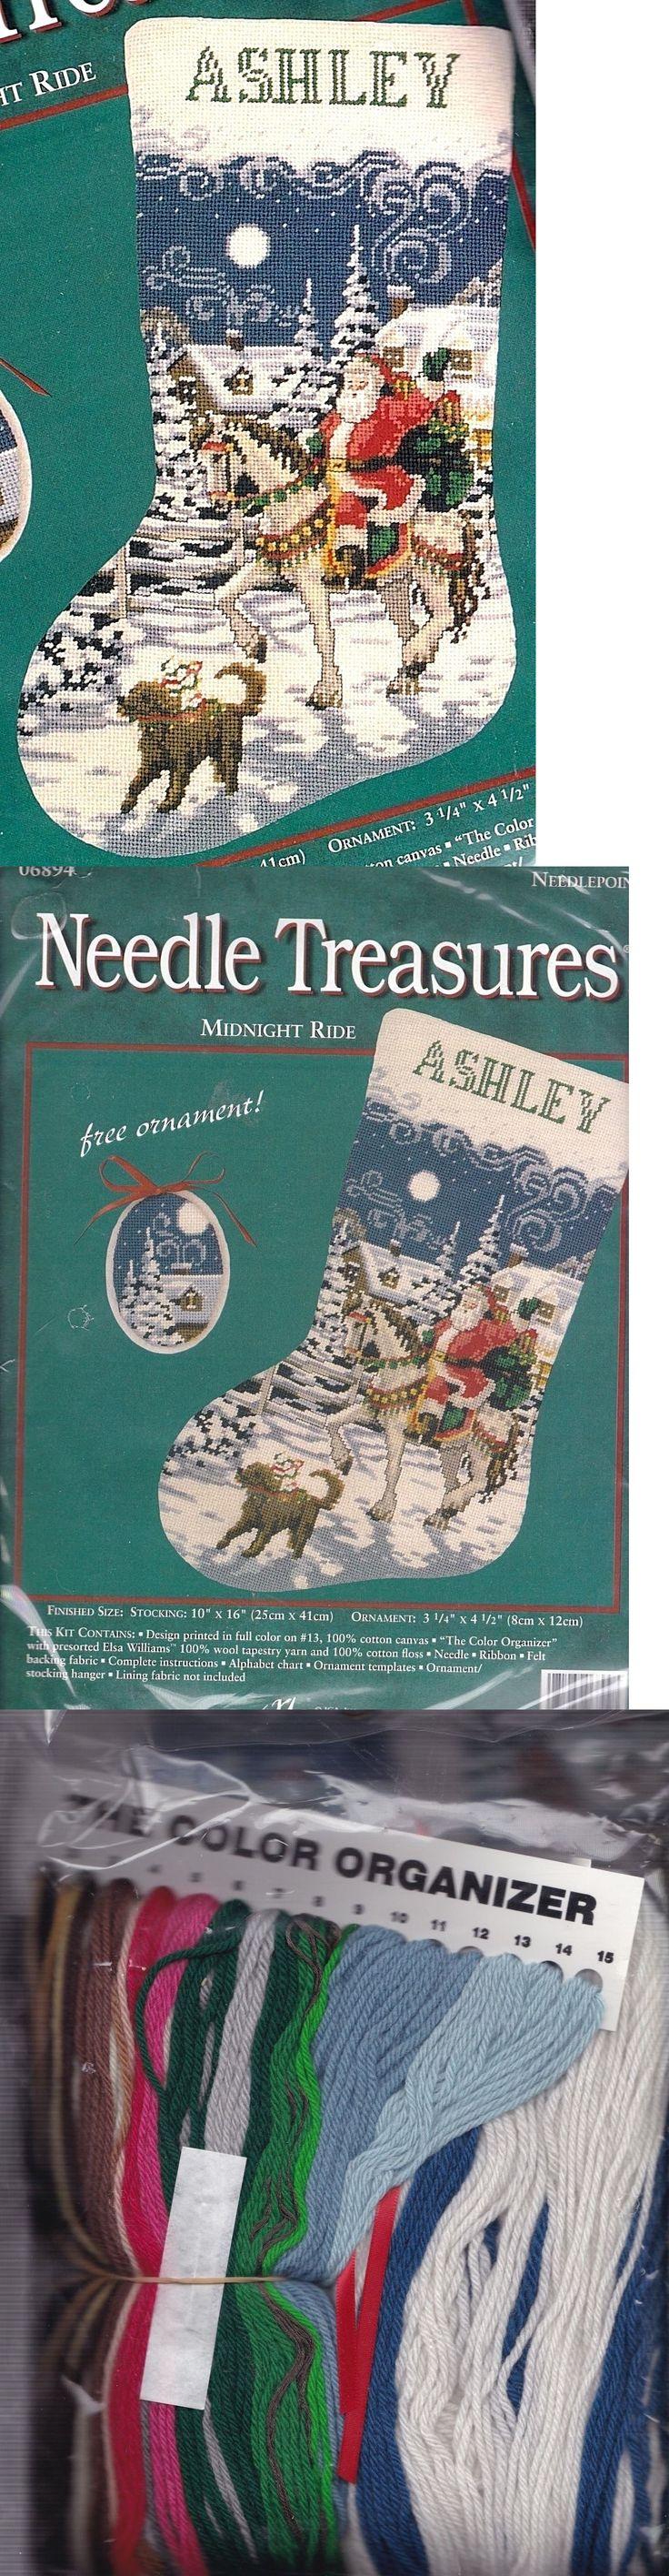 Other Hand Embroidery Kits 28142: Needle Treasures Midnight Ride Santa Horse Needlepoint Stocking Kit Nip 06894 -> BUY IT NOW ONLY: $239.95 on eBay!